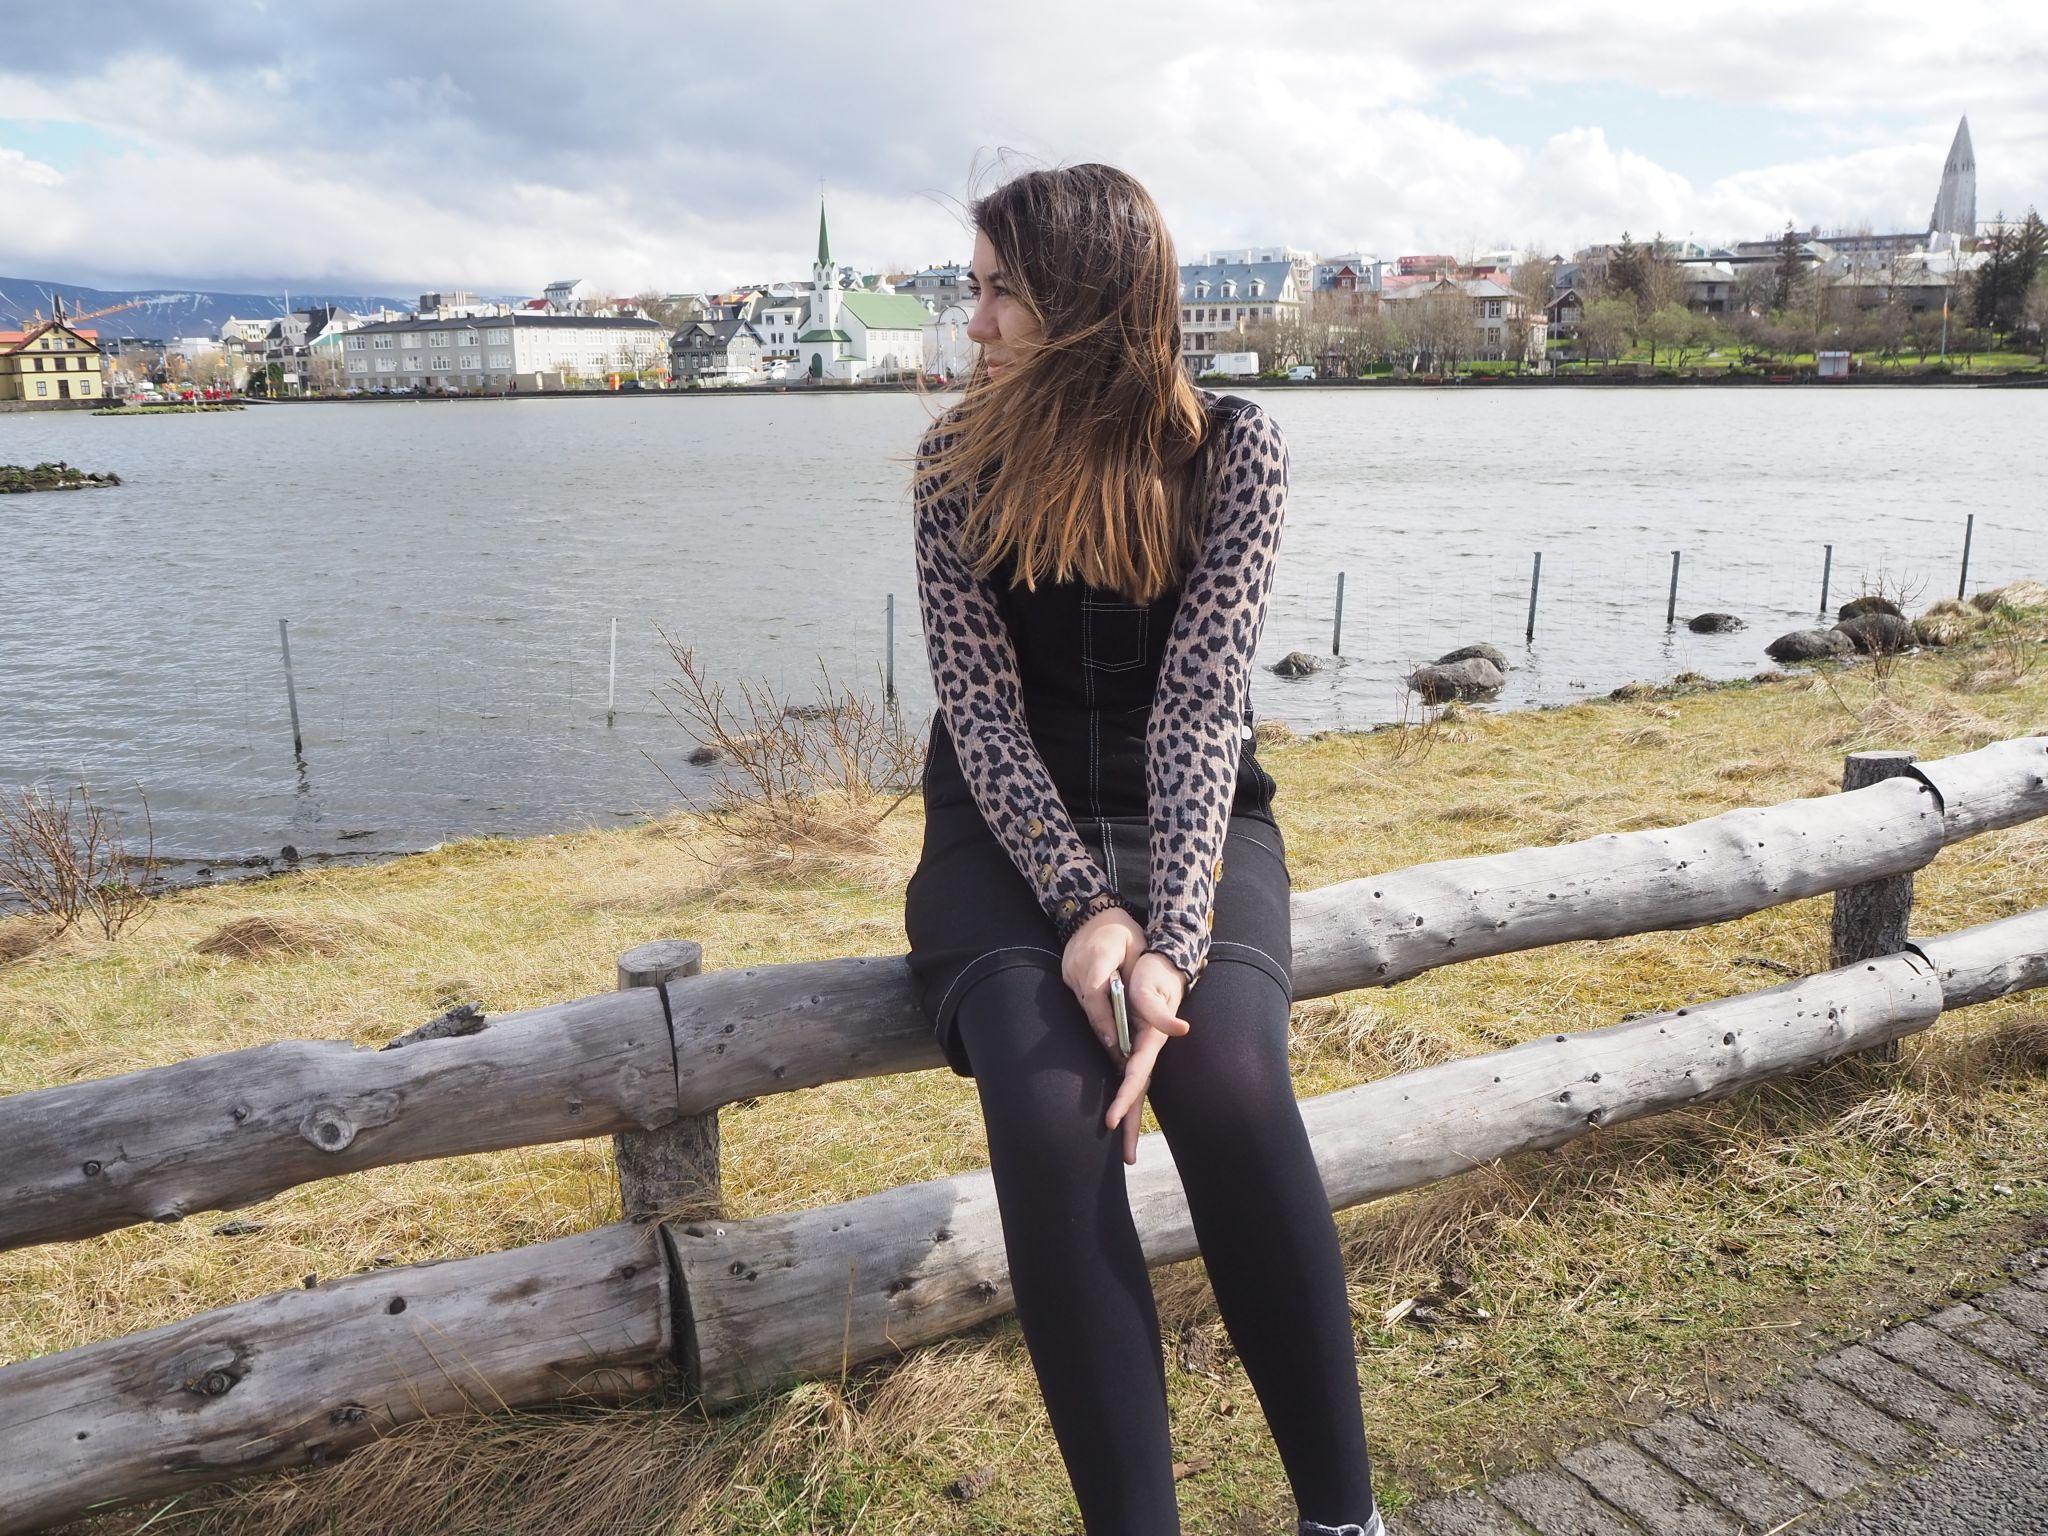 Iceland Travel Diary – Day 3: Exploring Reykjavík